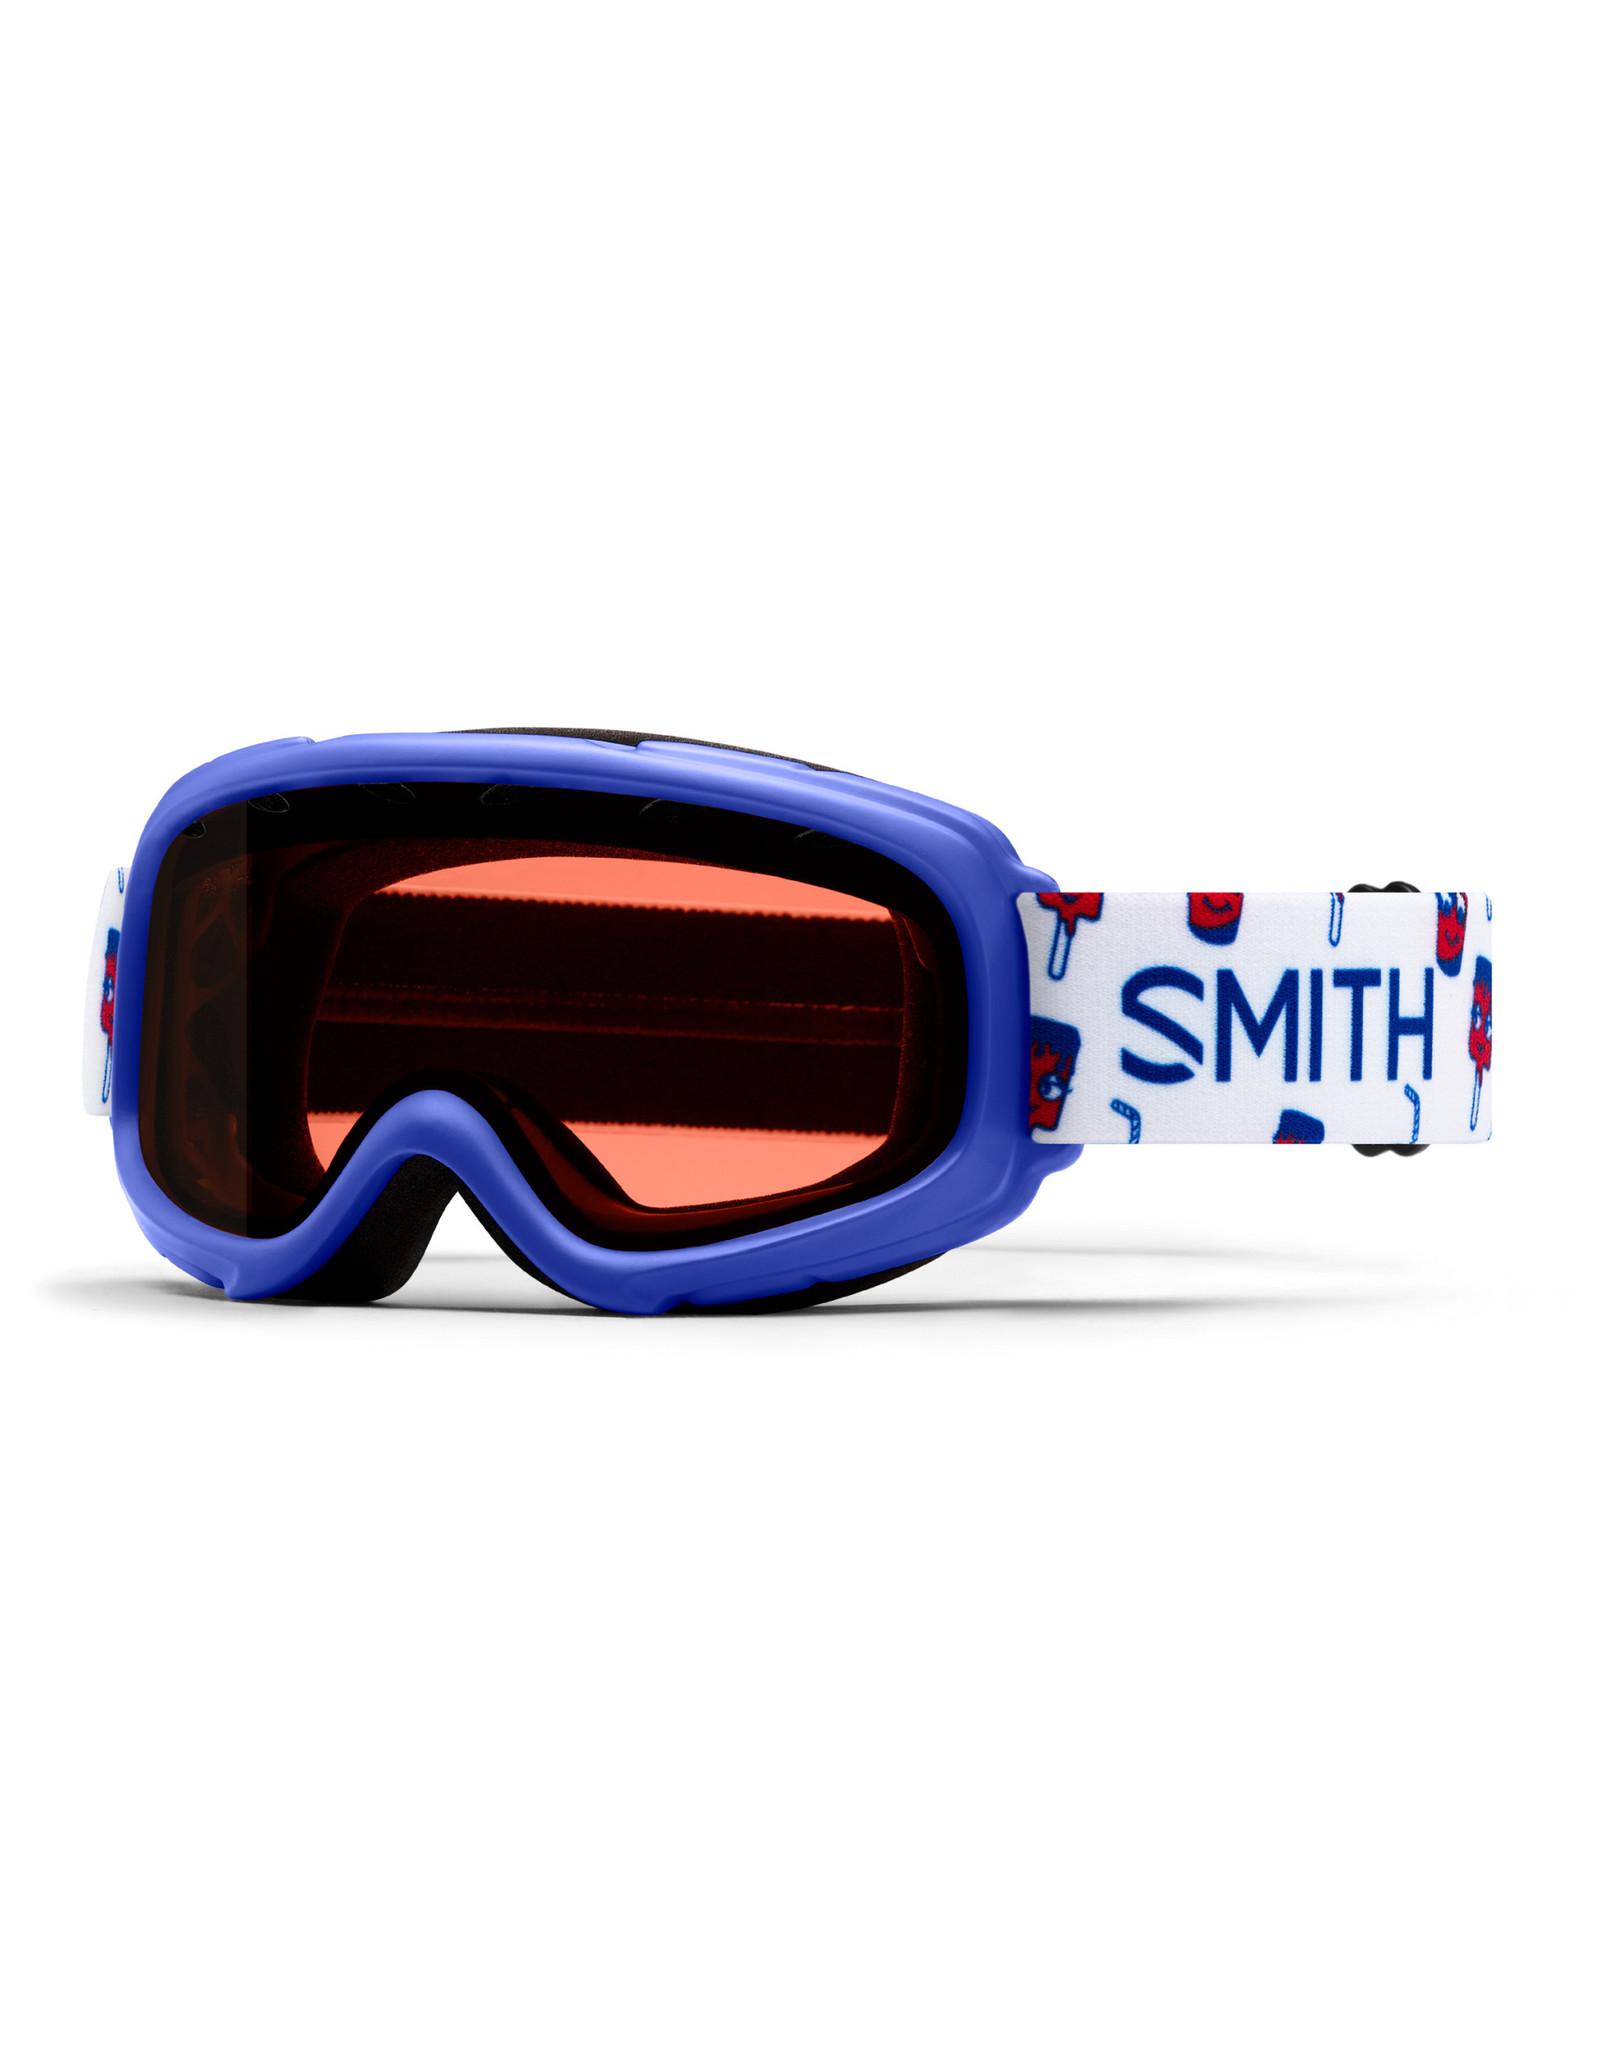 SMITH GAMBLER SKI GOGGLE BLUE JR 21